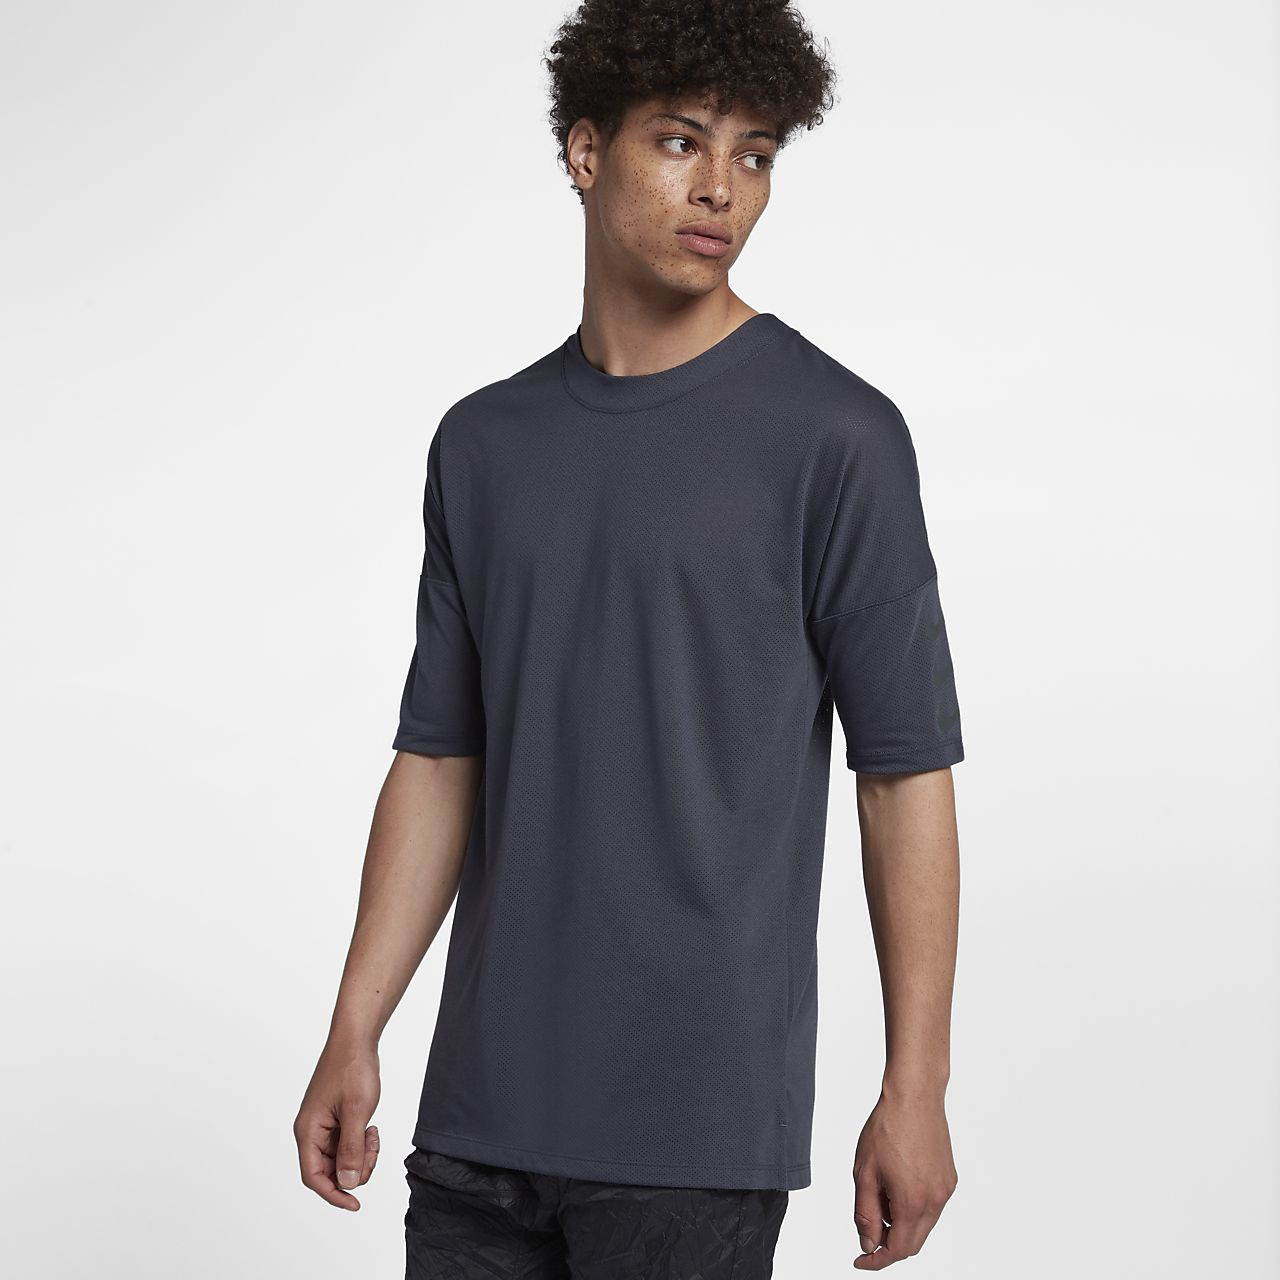 Nike Rise 365 男子五分袖跑步上衣